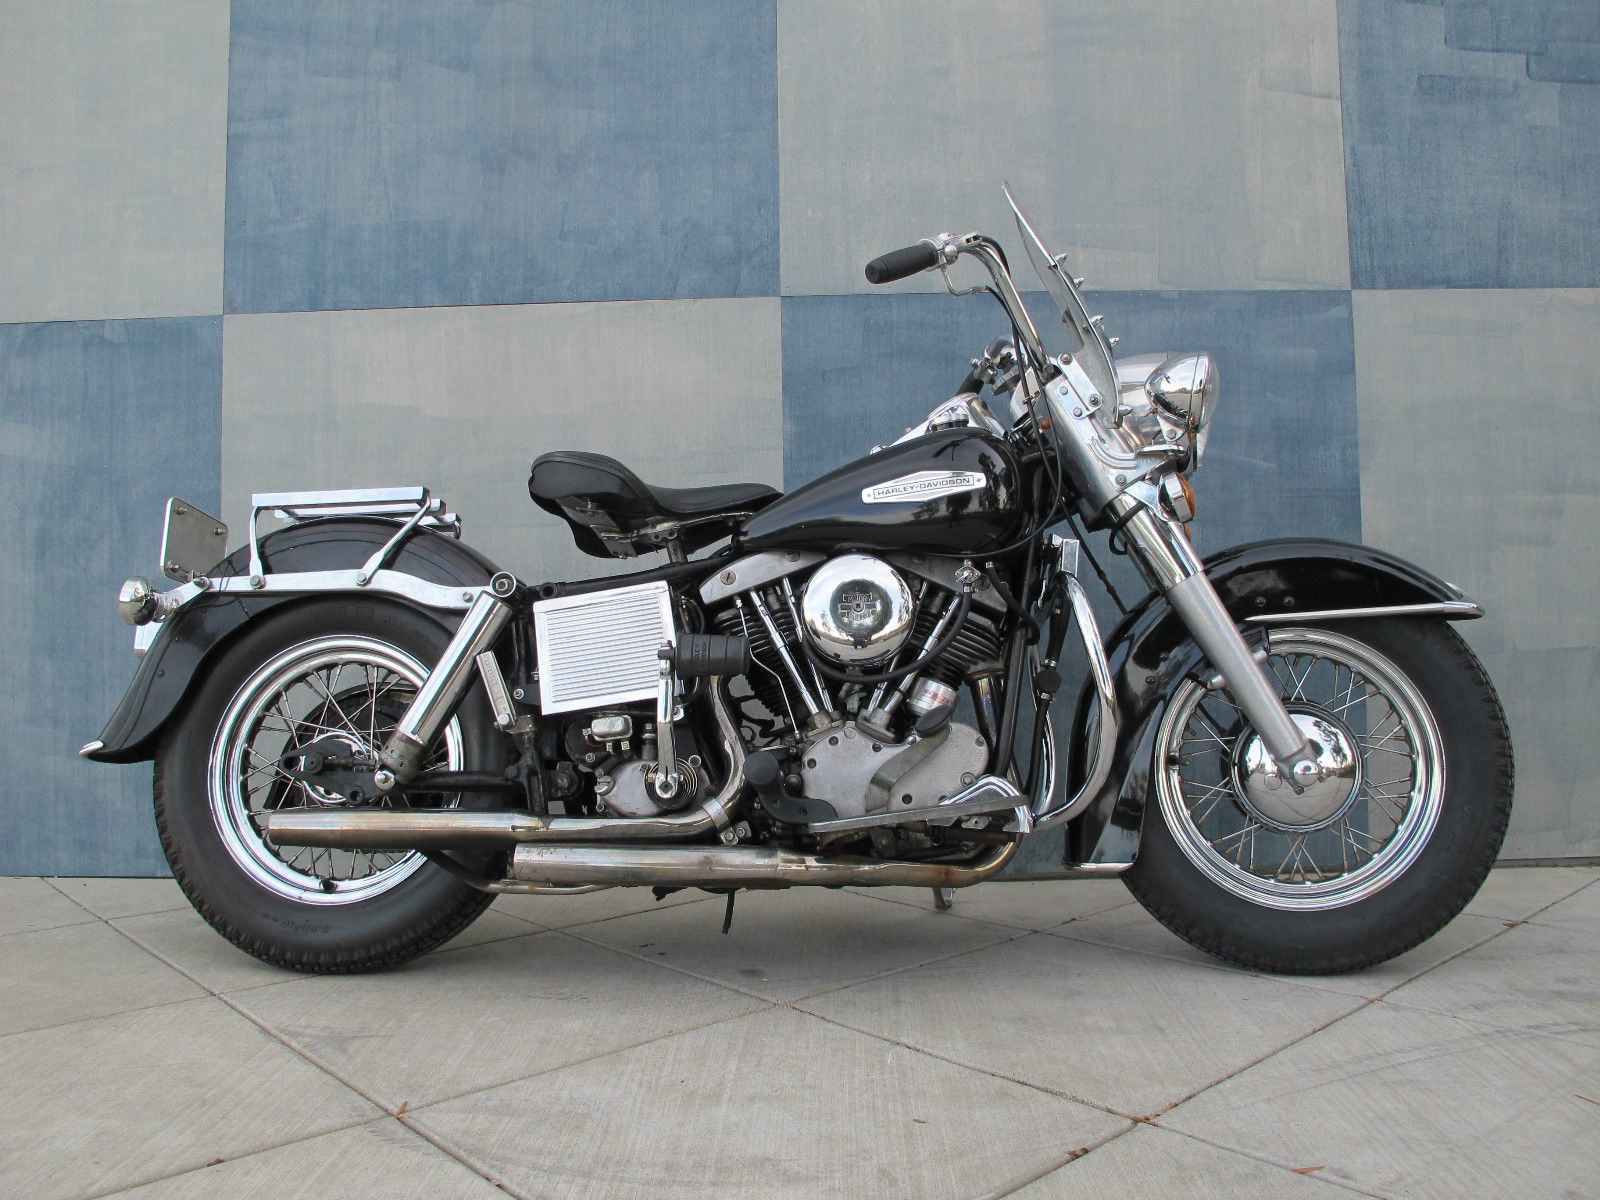 Harley Davidson First Bike >> 1966 HARLEY DAVIDSON SHOVELHEAD VERY ORIGINAL CALIFORNIA BIKE panhead flathead